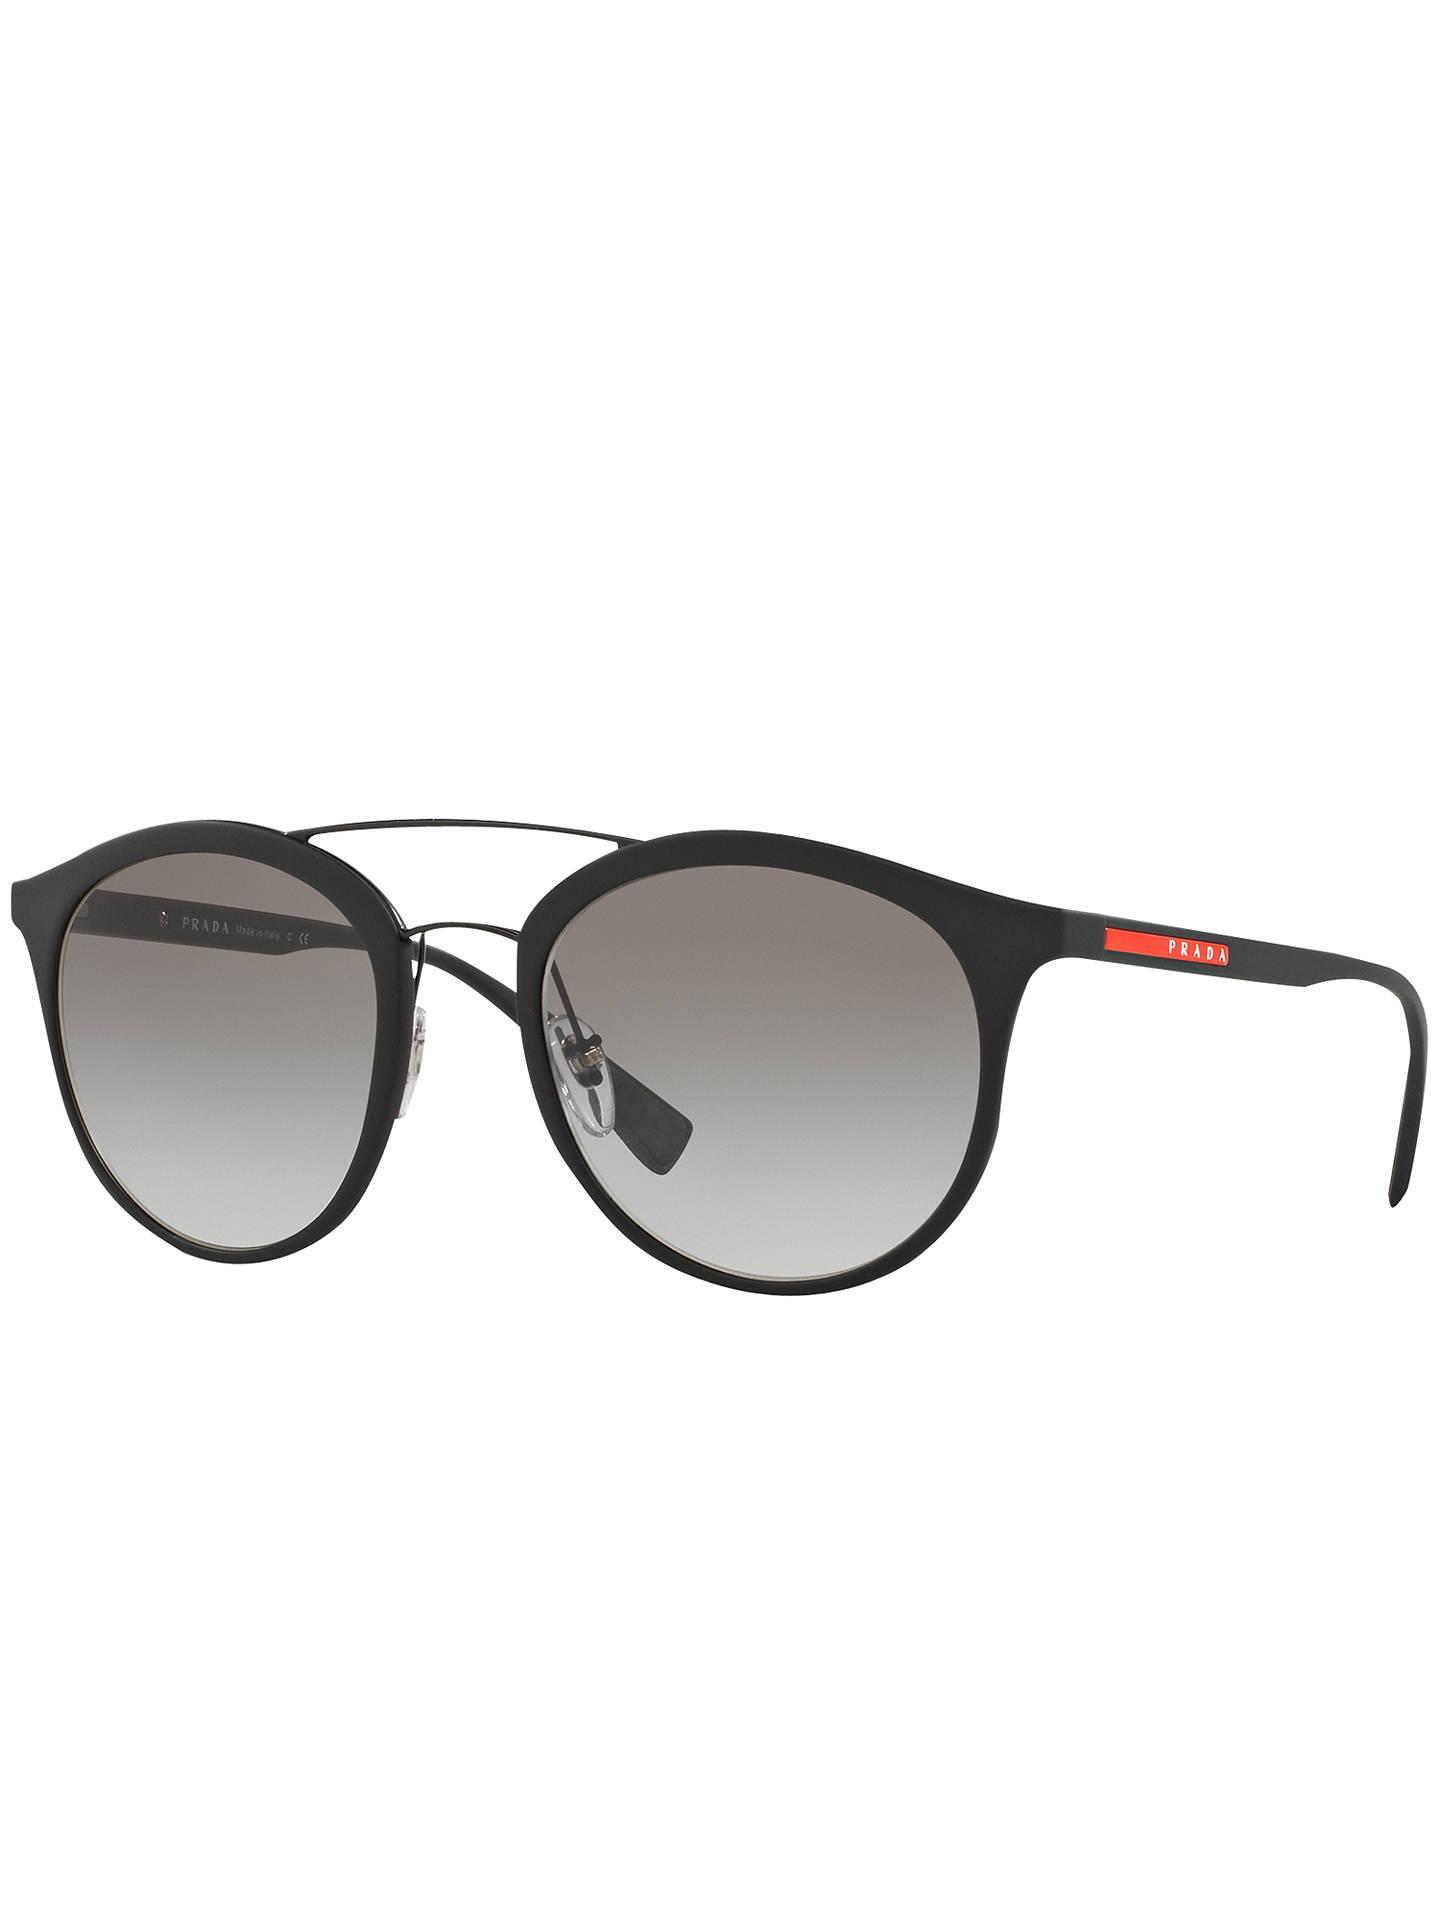 f17c0d0b36be Buy Prada Linea Rossa PS 04RS Oval Sunglasses, Black/Grey Gradient Online  at johnlewis ...